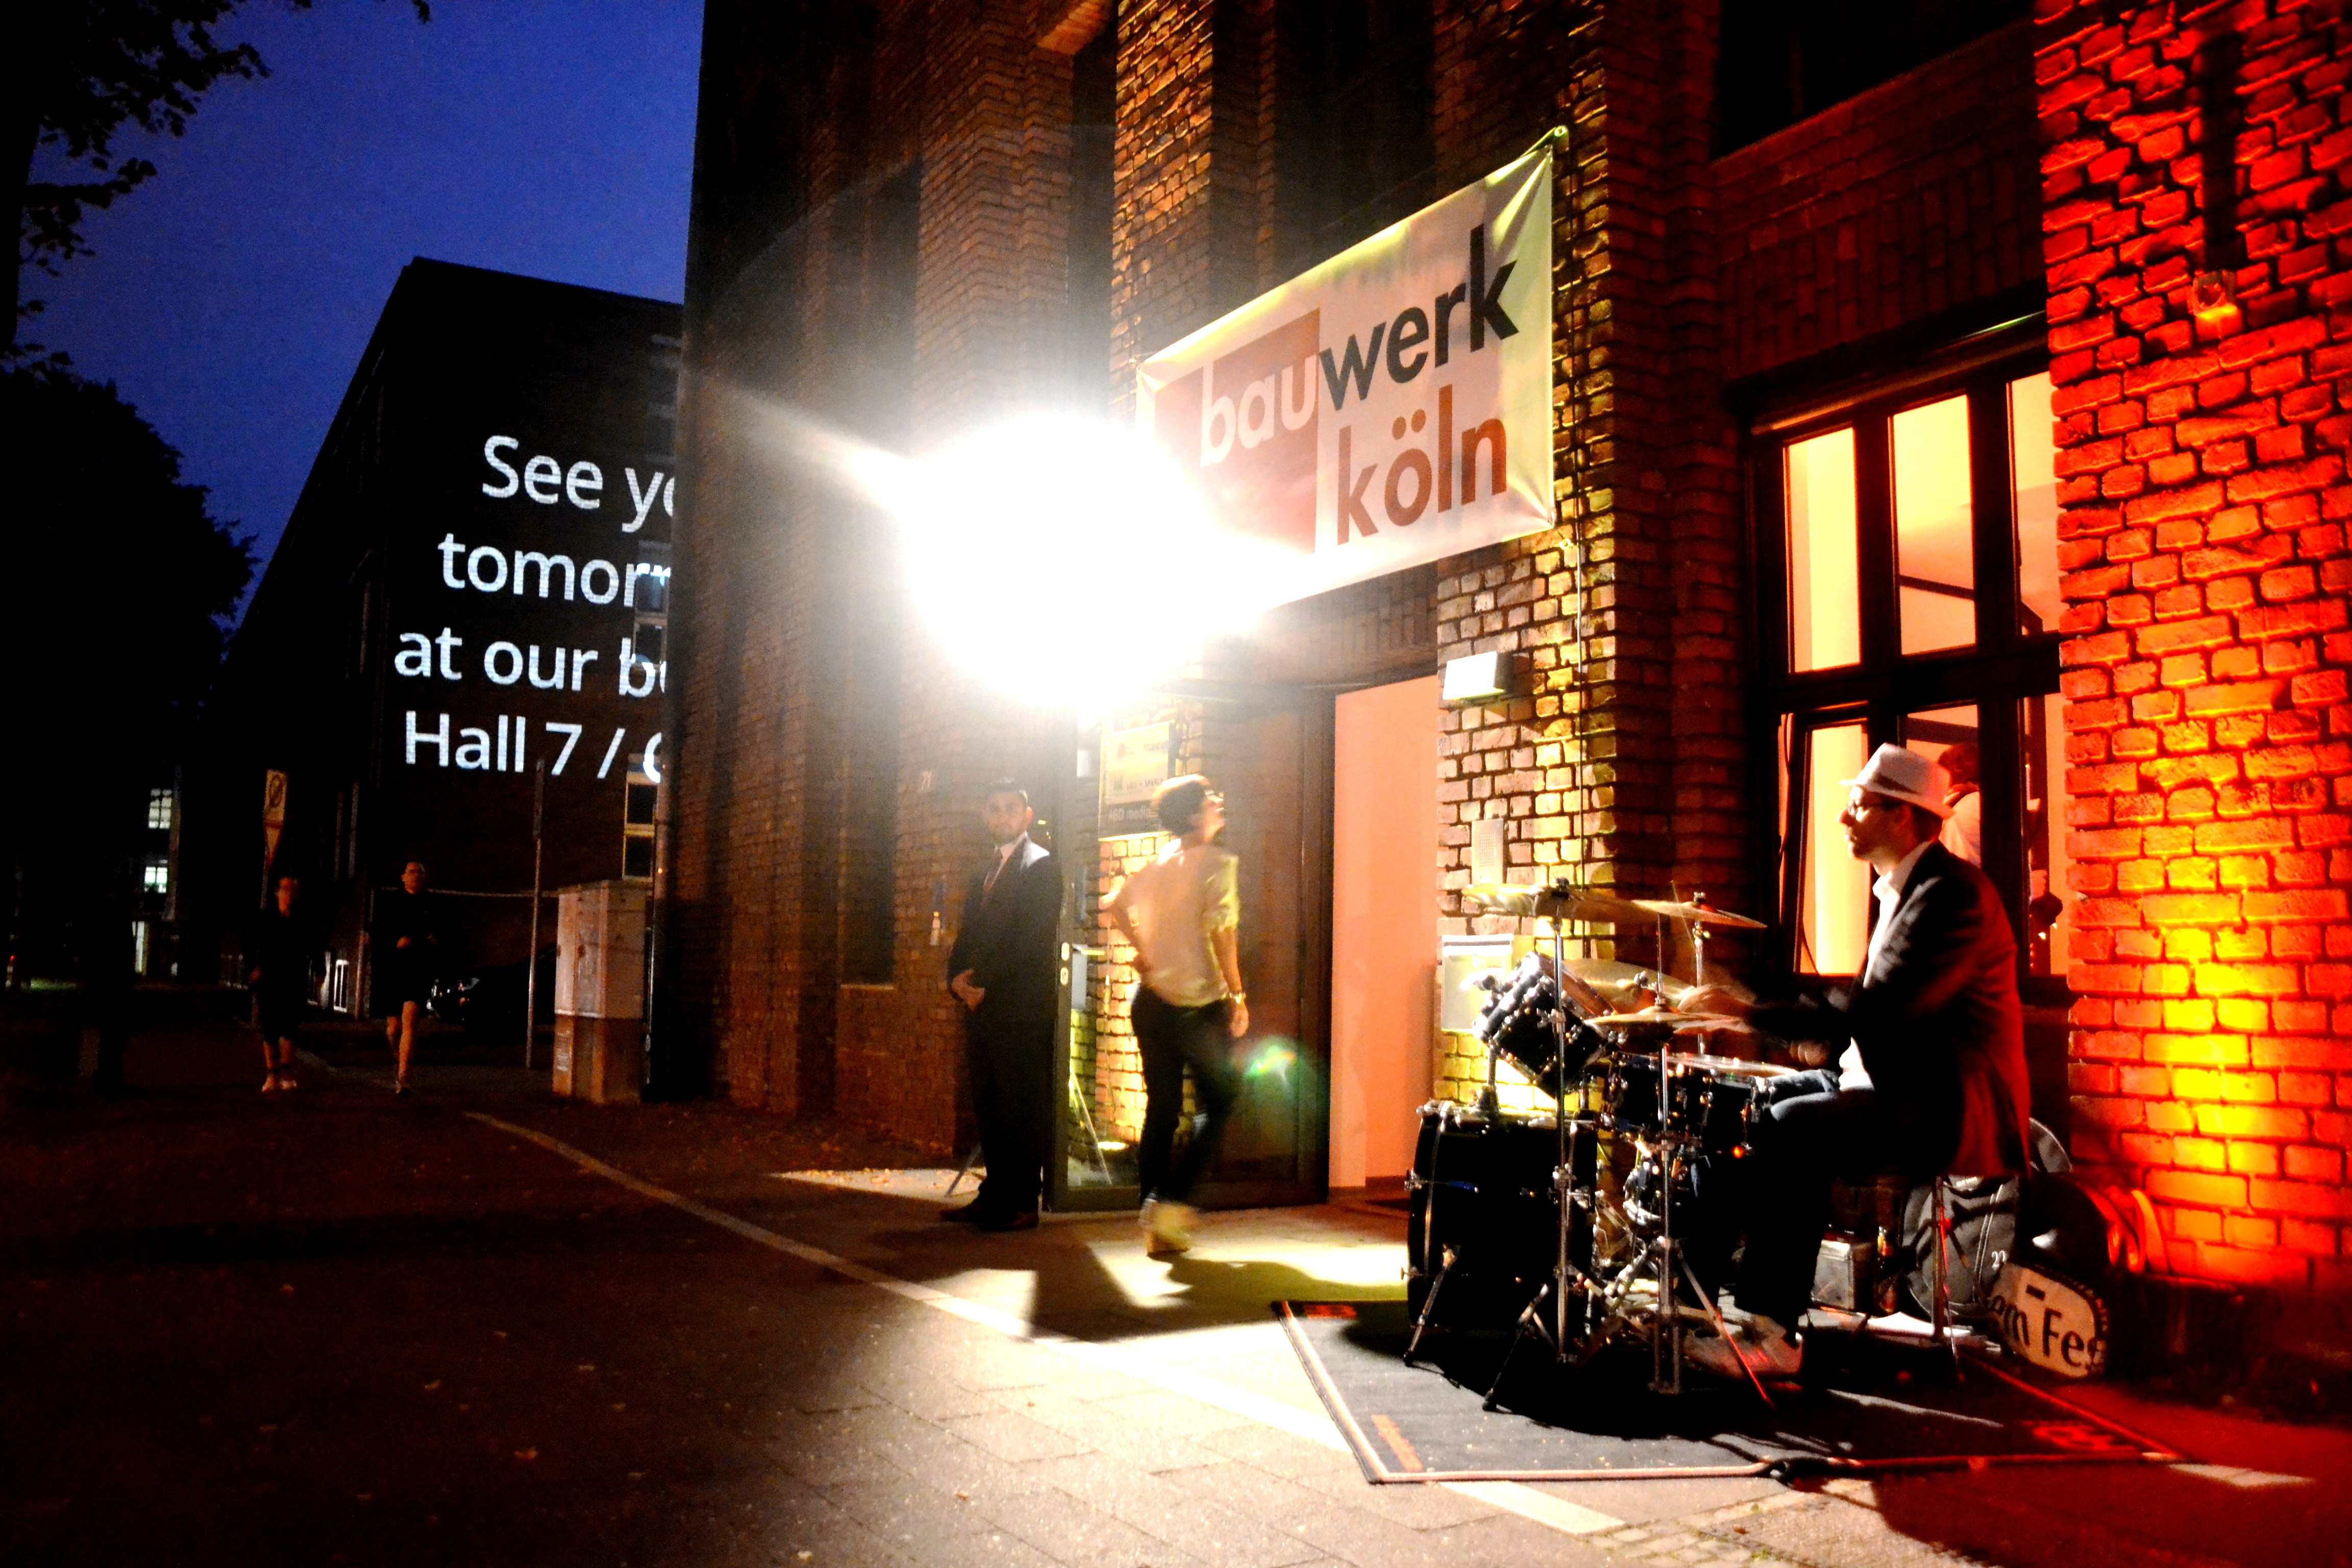 Video: bauwerk K�ln - Der Film